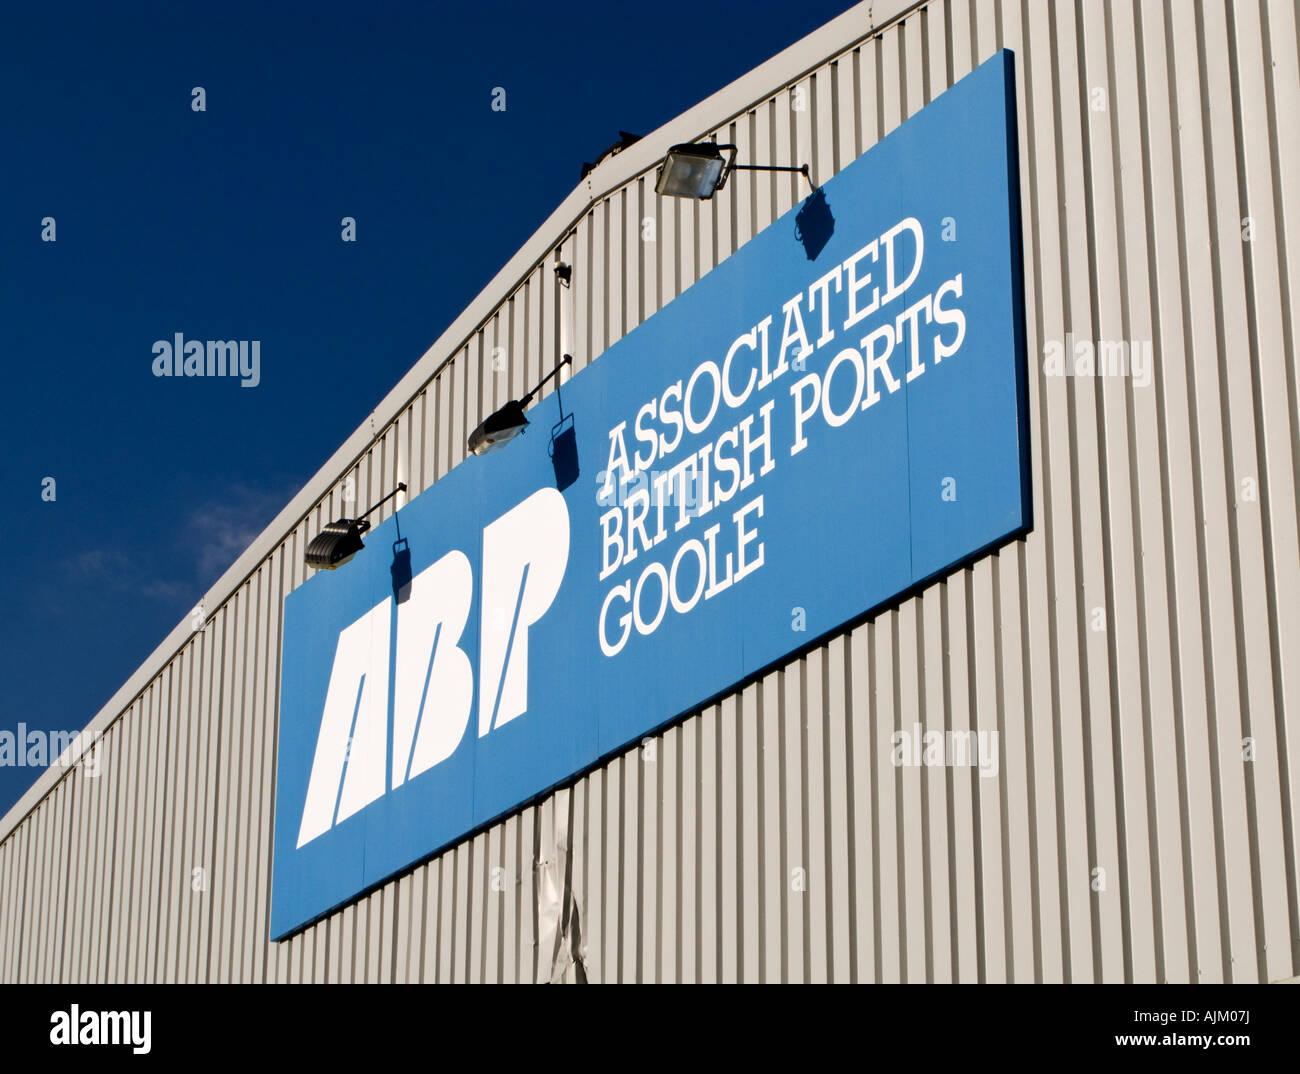 Associated British Ports sign at Goole docks, East Yorkshire, UK - Stock Image